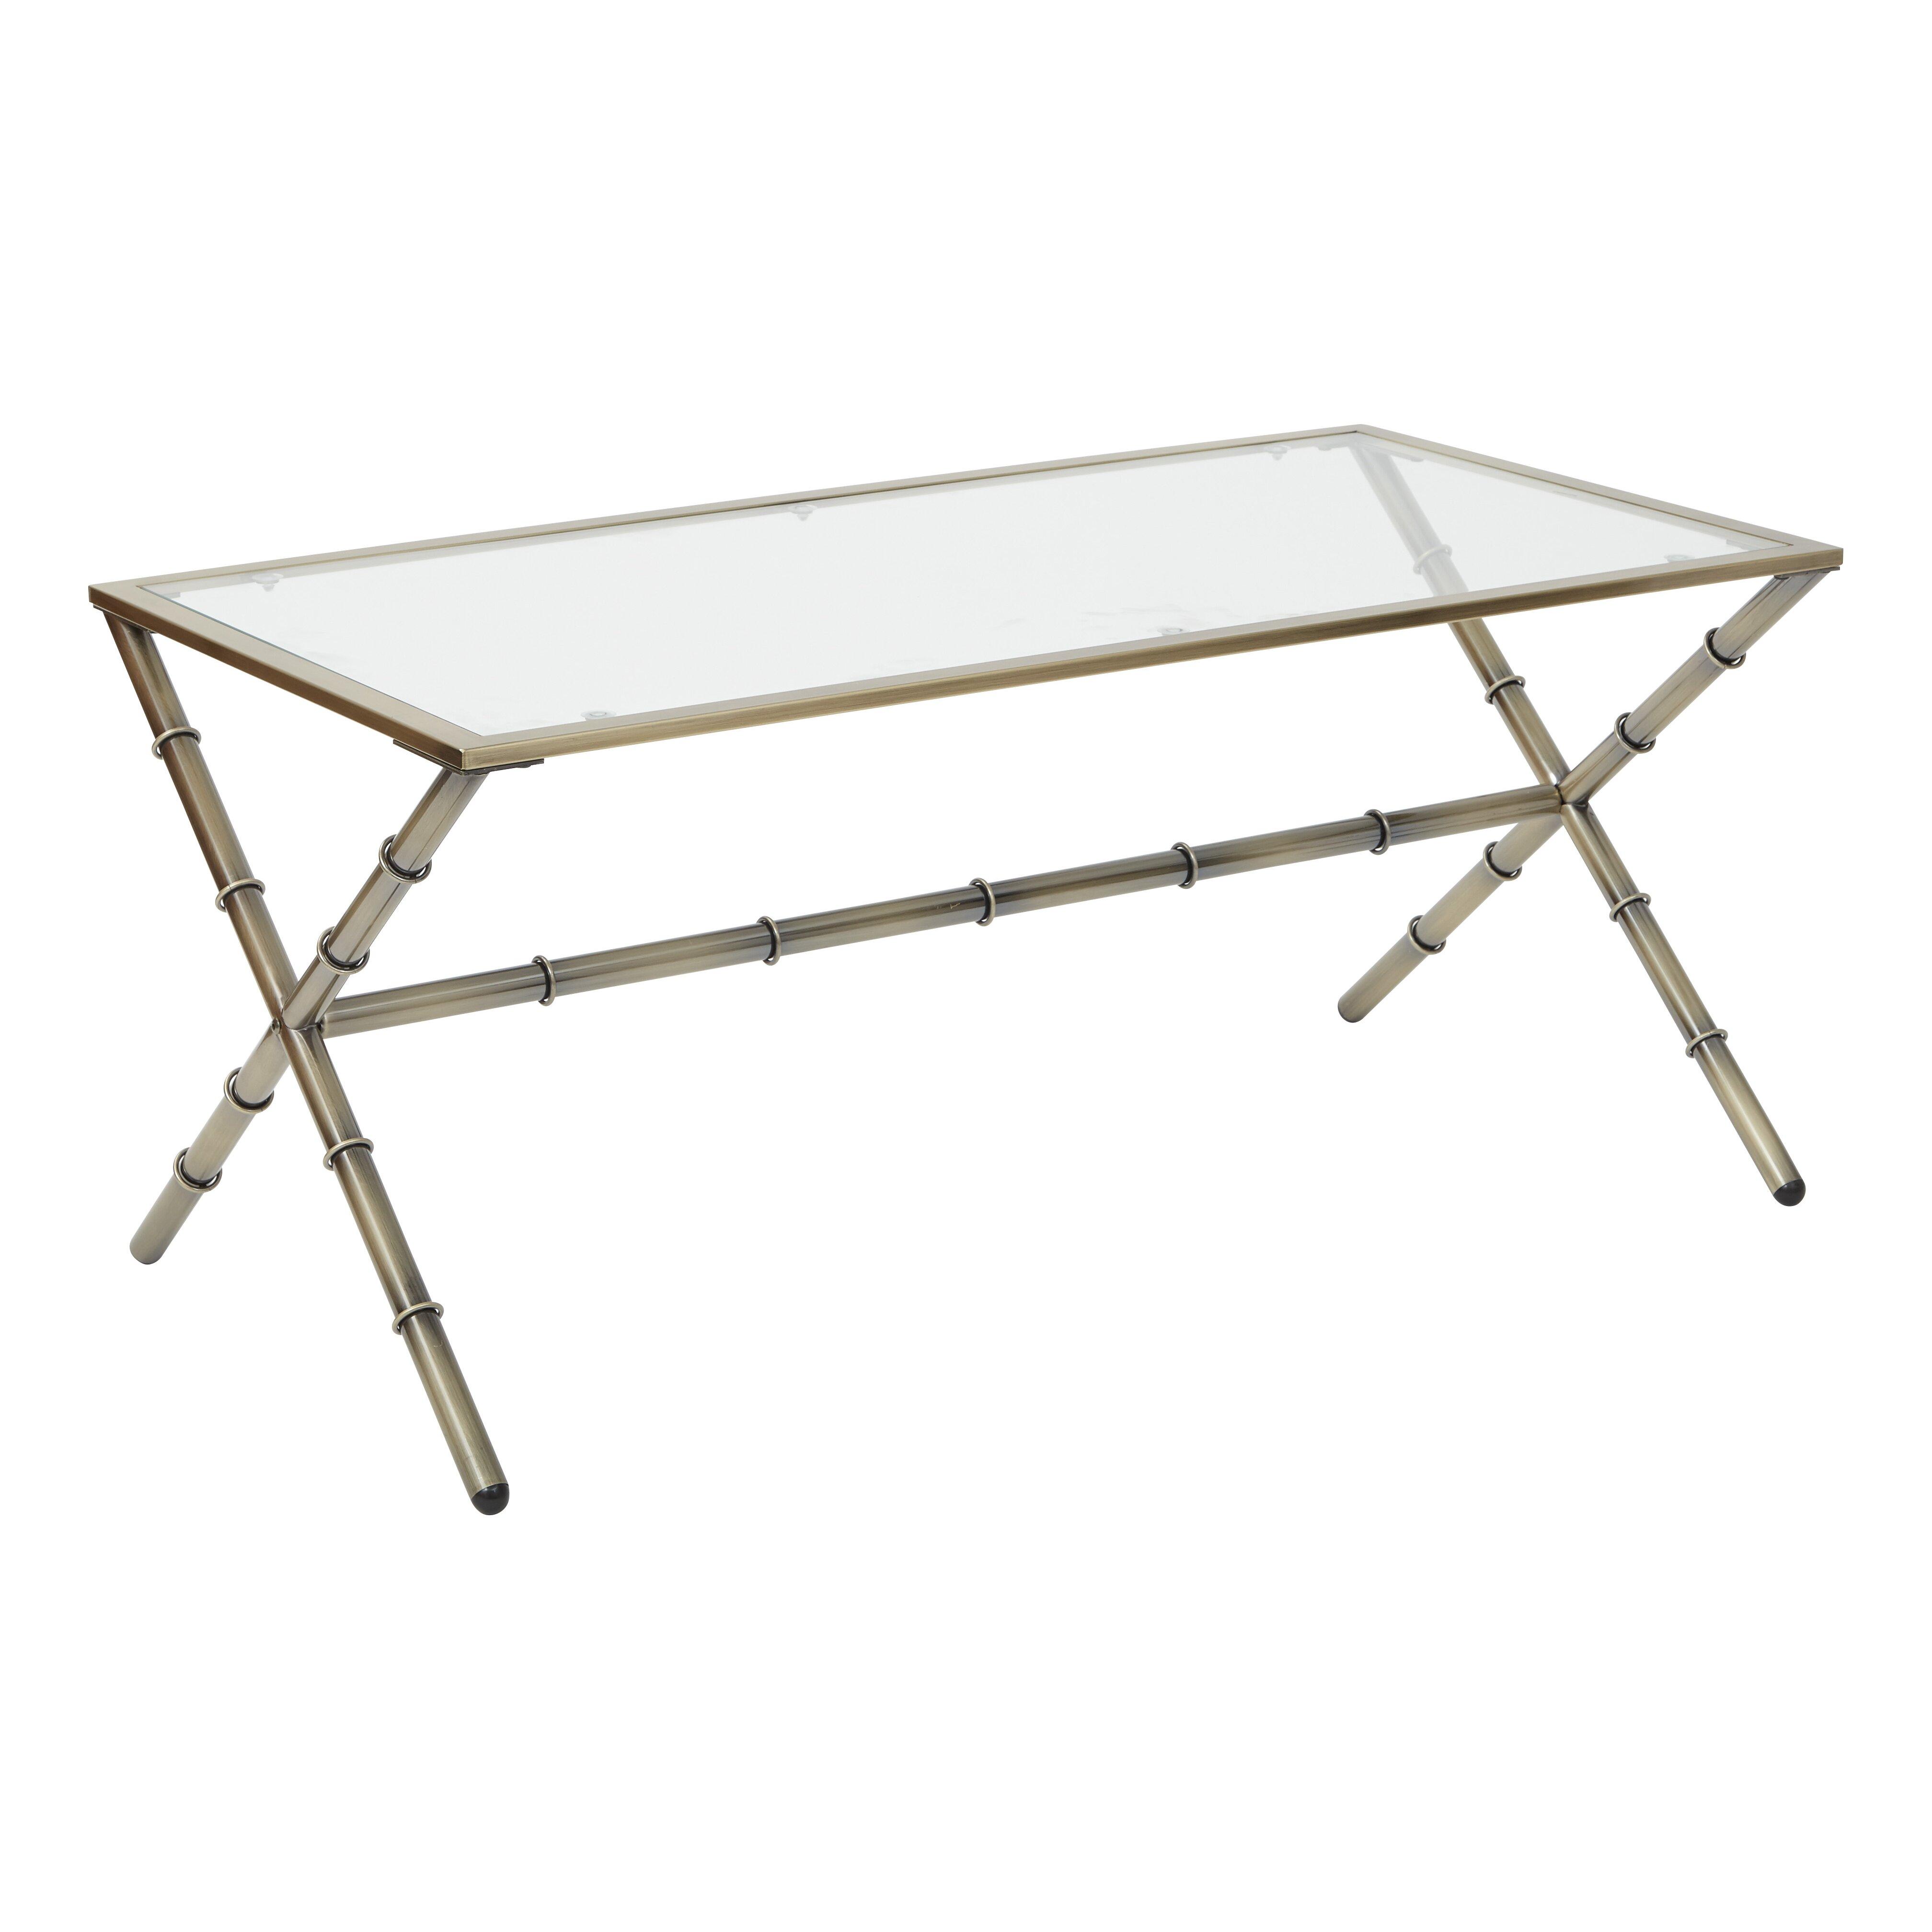 Brass Coffee Table Target: OSP Designs Lanai Coffee Table & Reviews